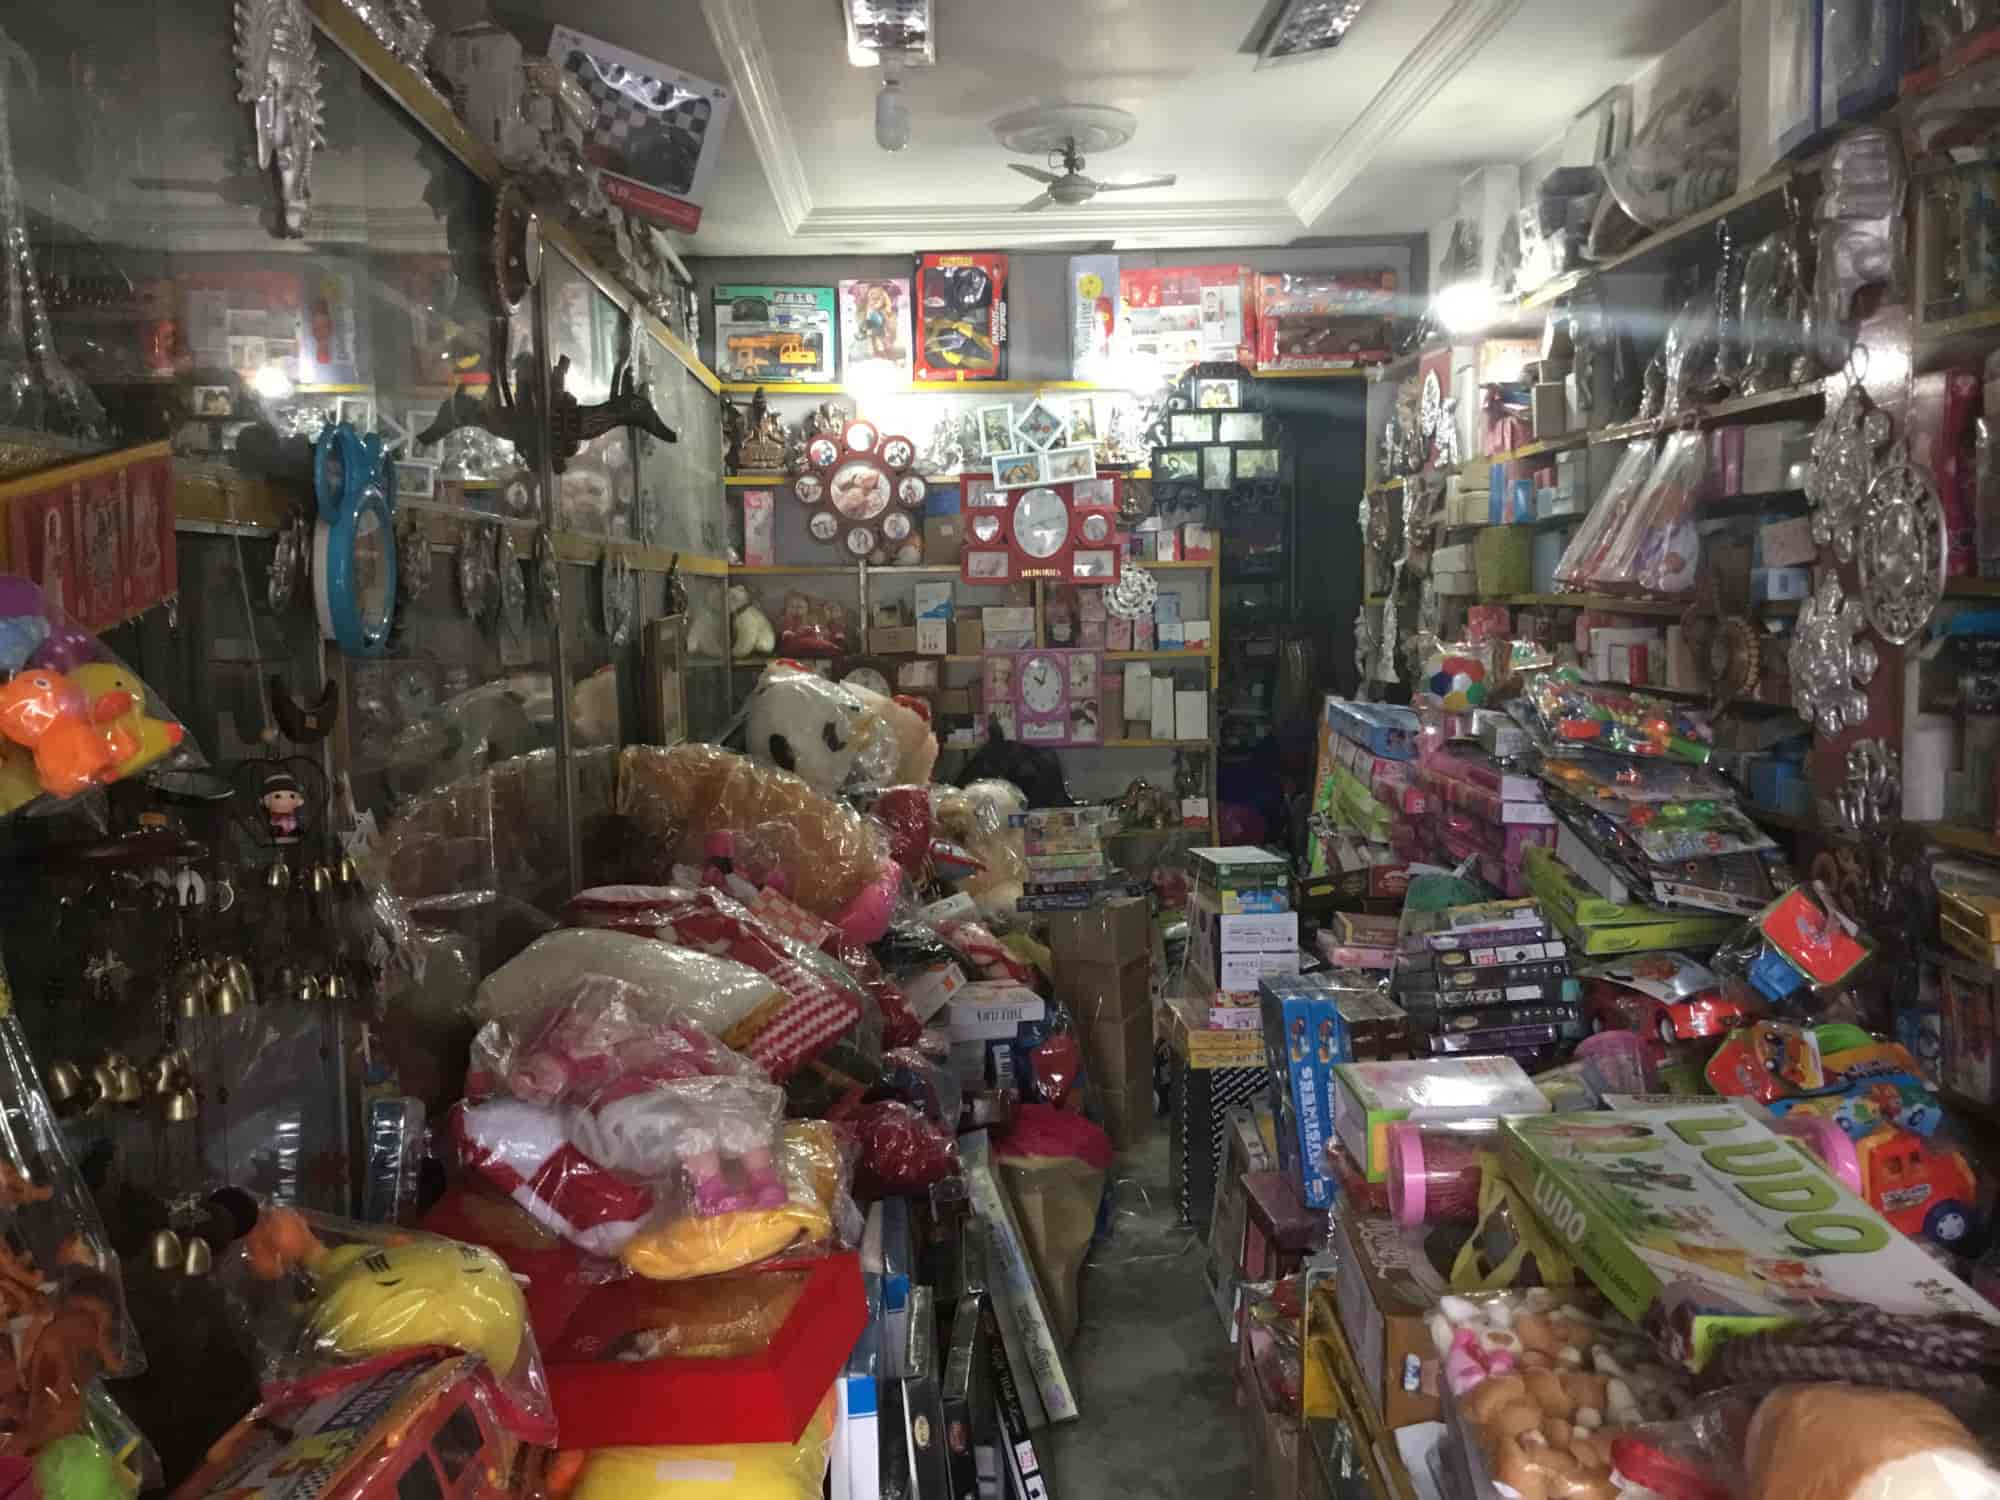 Rajasthan Handicrafts Shop Photos Udaipur City Udaipur Rajasthan